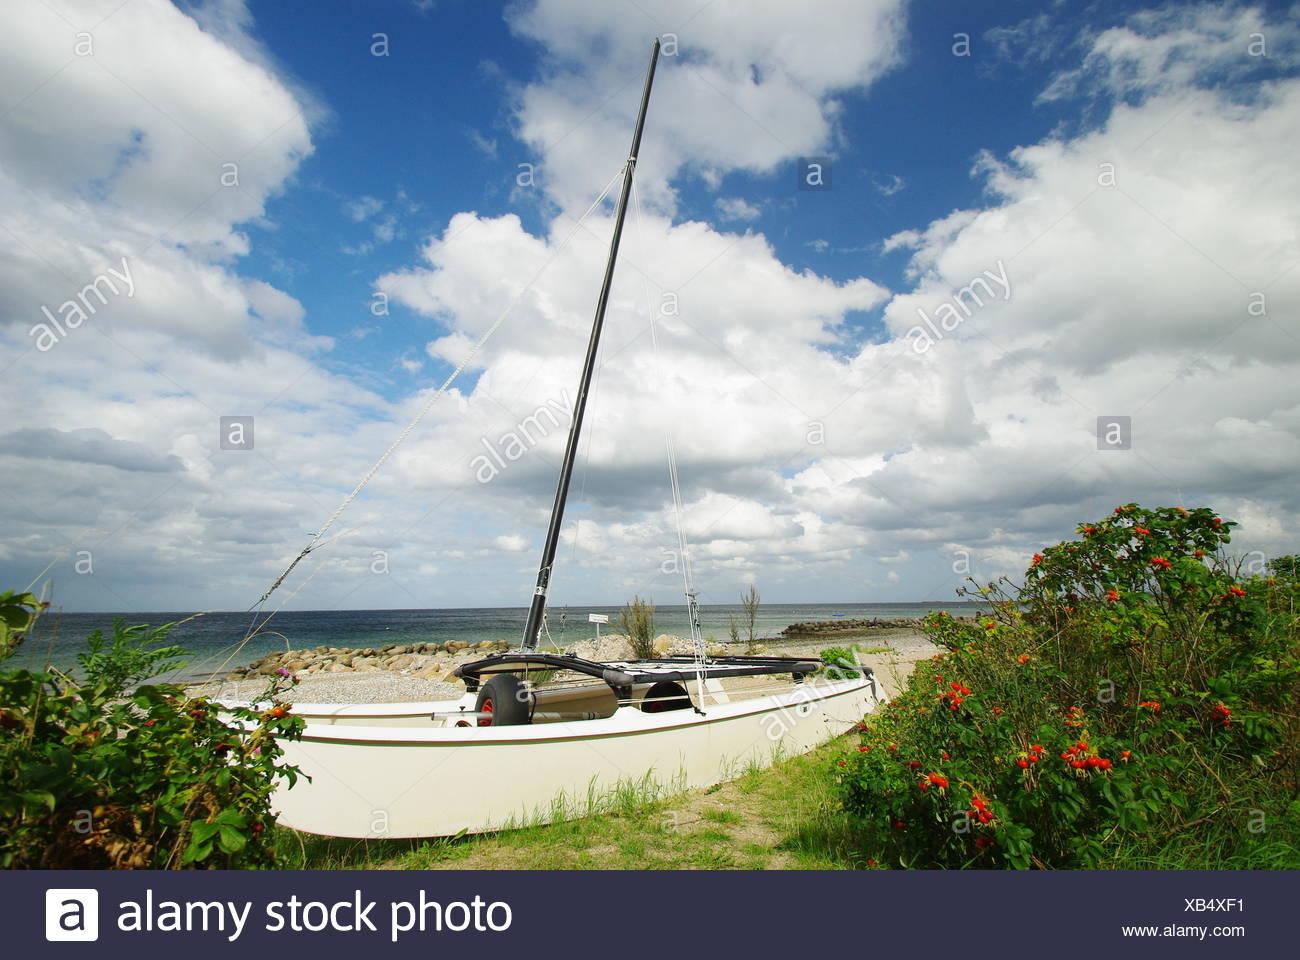 catamaran on the beach of schonhagen - Stock Image